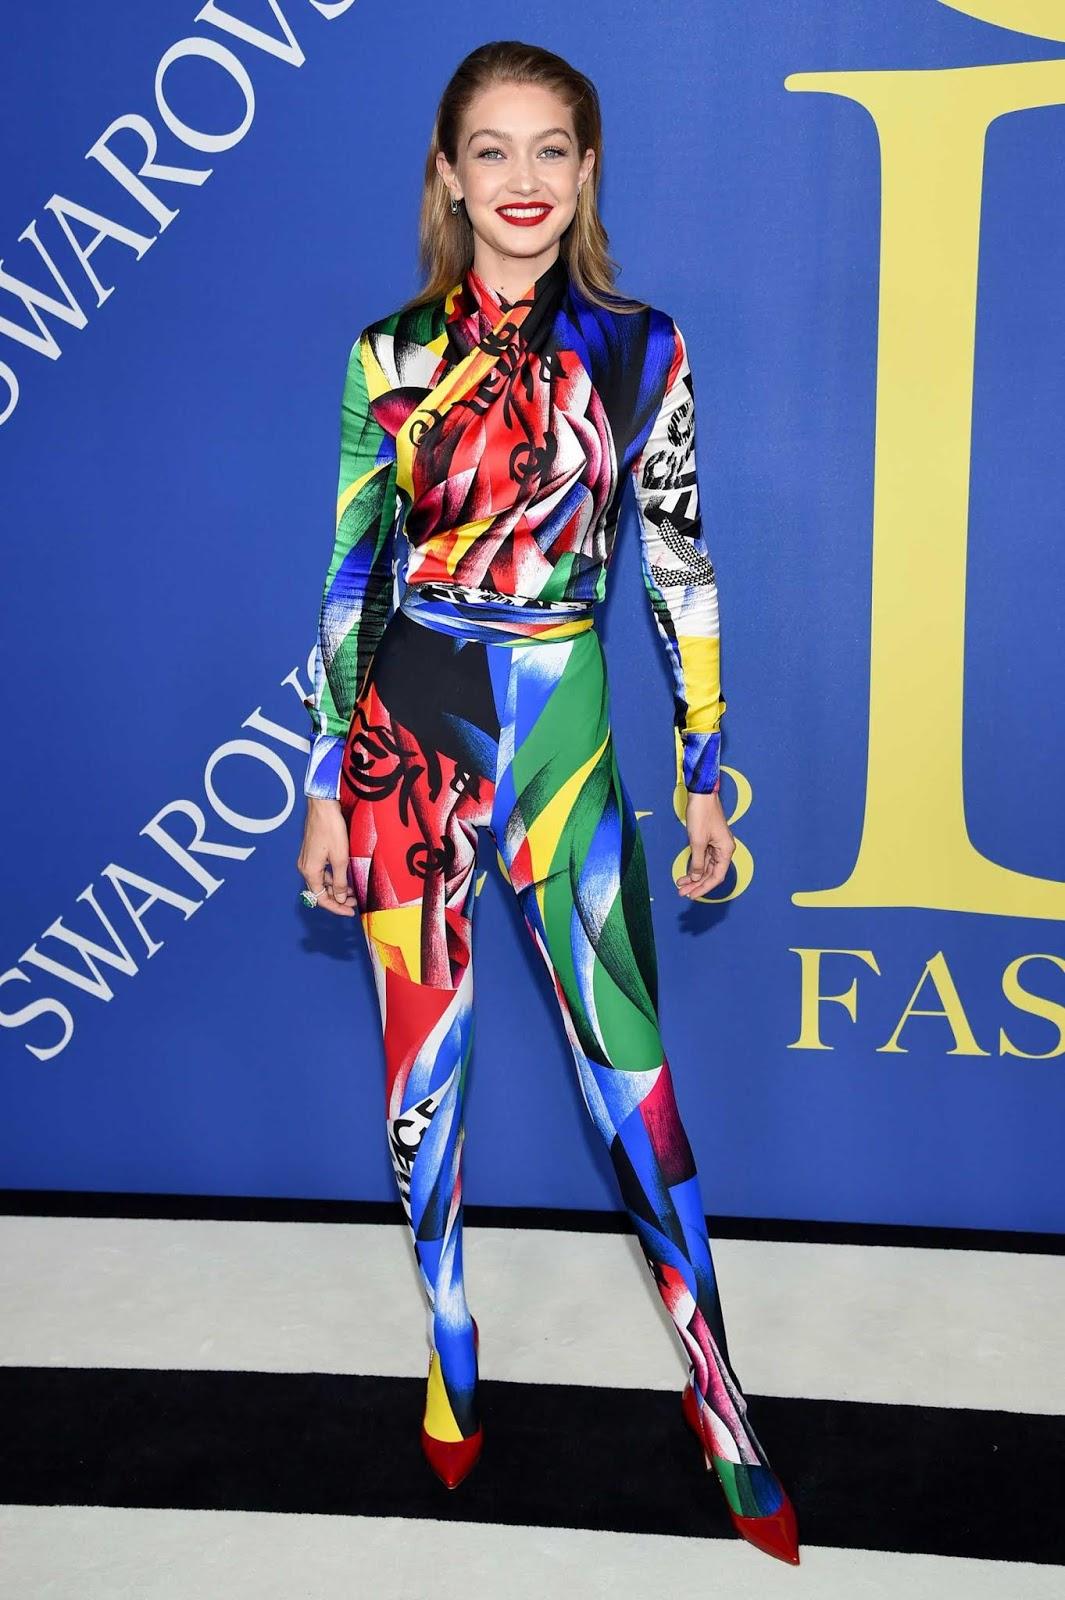 Gigi Hadid flaunts graphic suit at the 2018 CFDA Fashion Awards